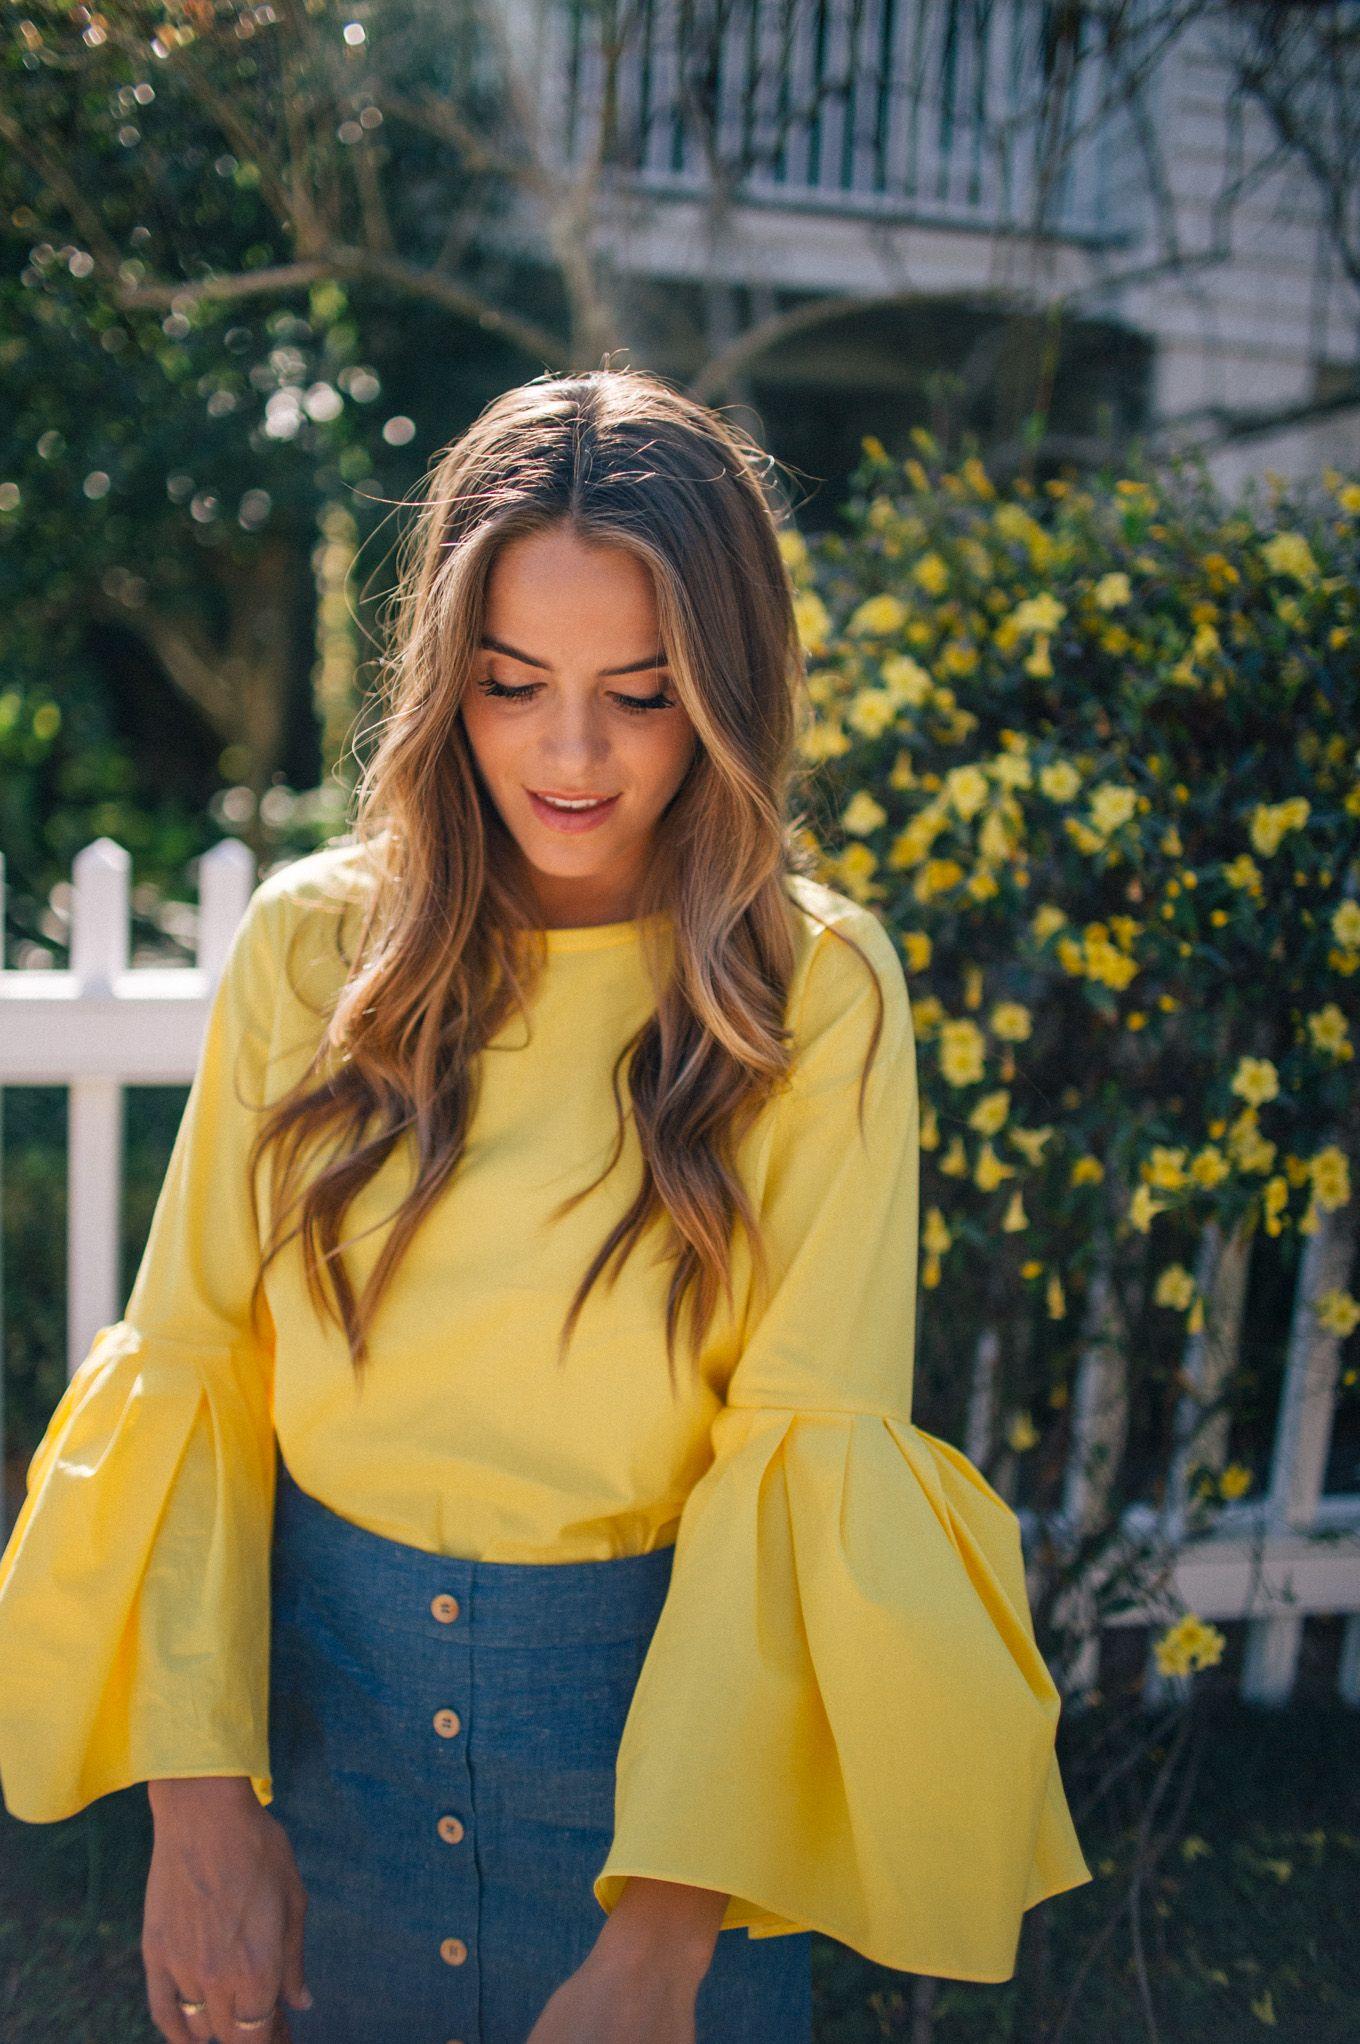 f8a1632adddc8 Gal Meets Glam Yellow Bell Sleeved Top - Zara top   Sezane skirt